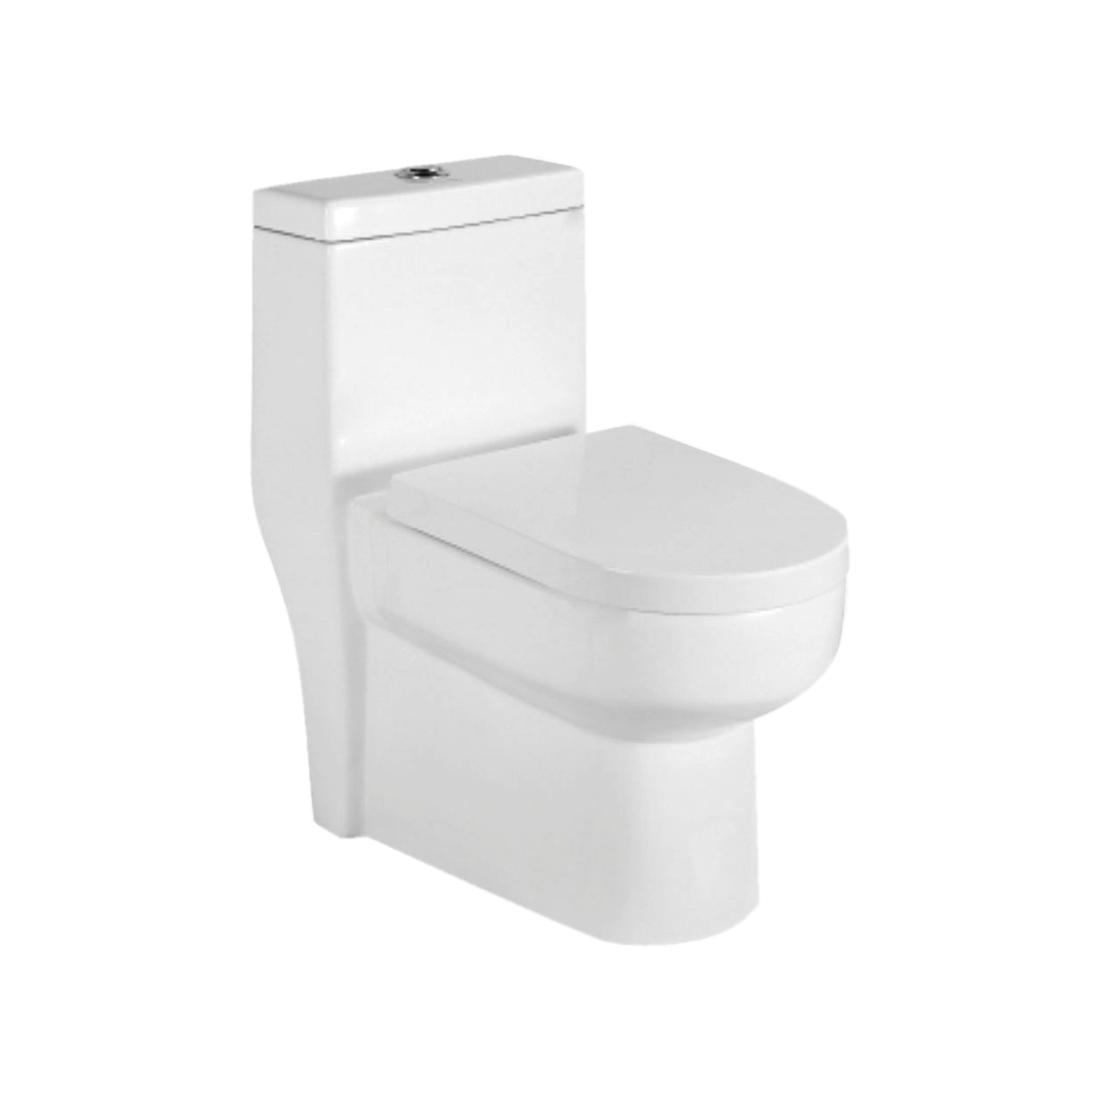 Kerovit Gazebo KB09018 Siphonic Single Piece European Rimfree Water Closet With Seat Cover